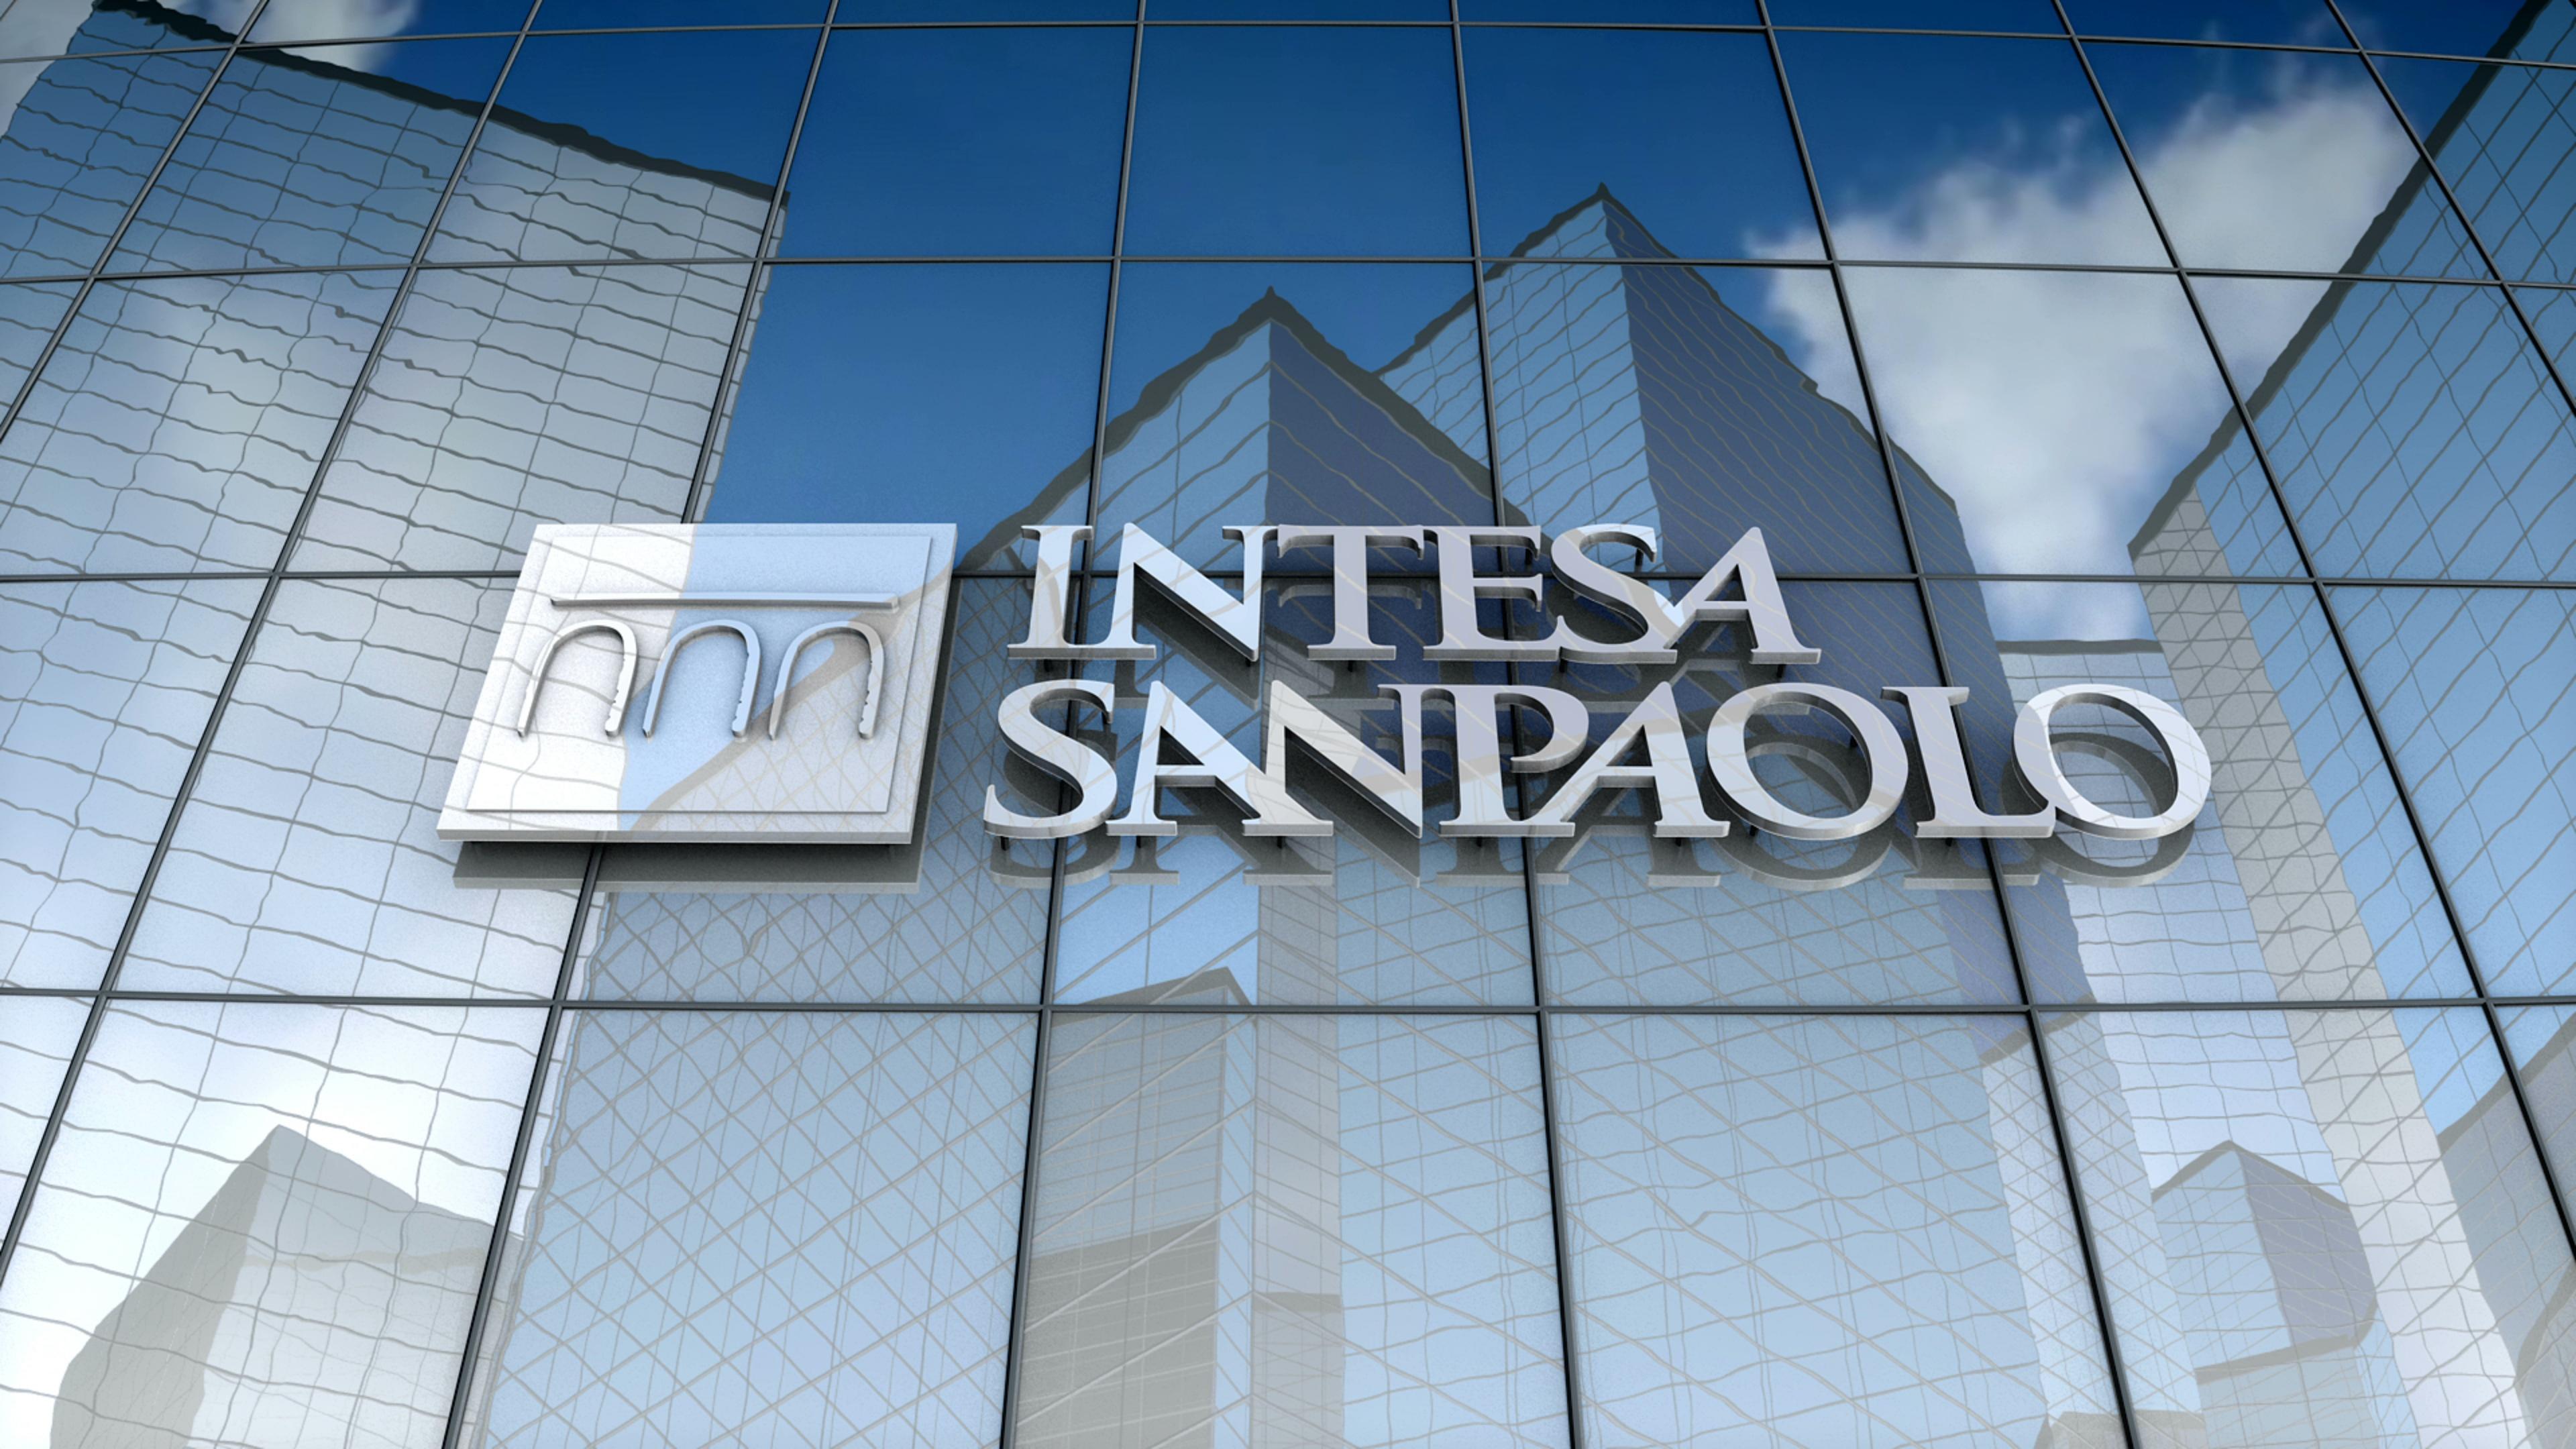 intesa-sanpaolo